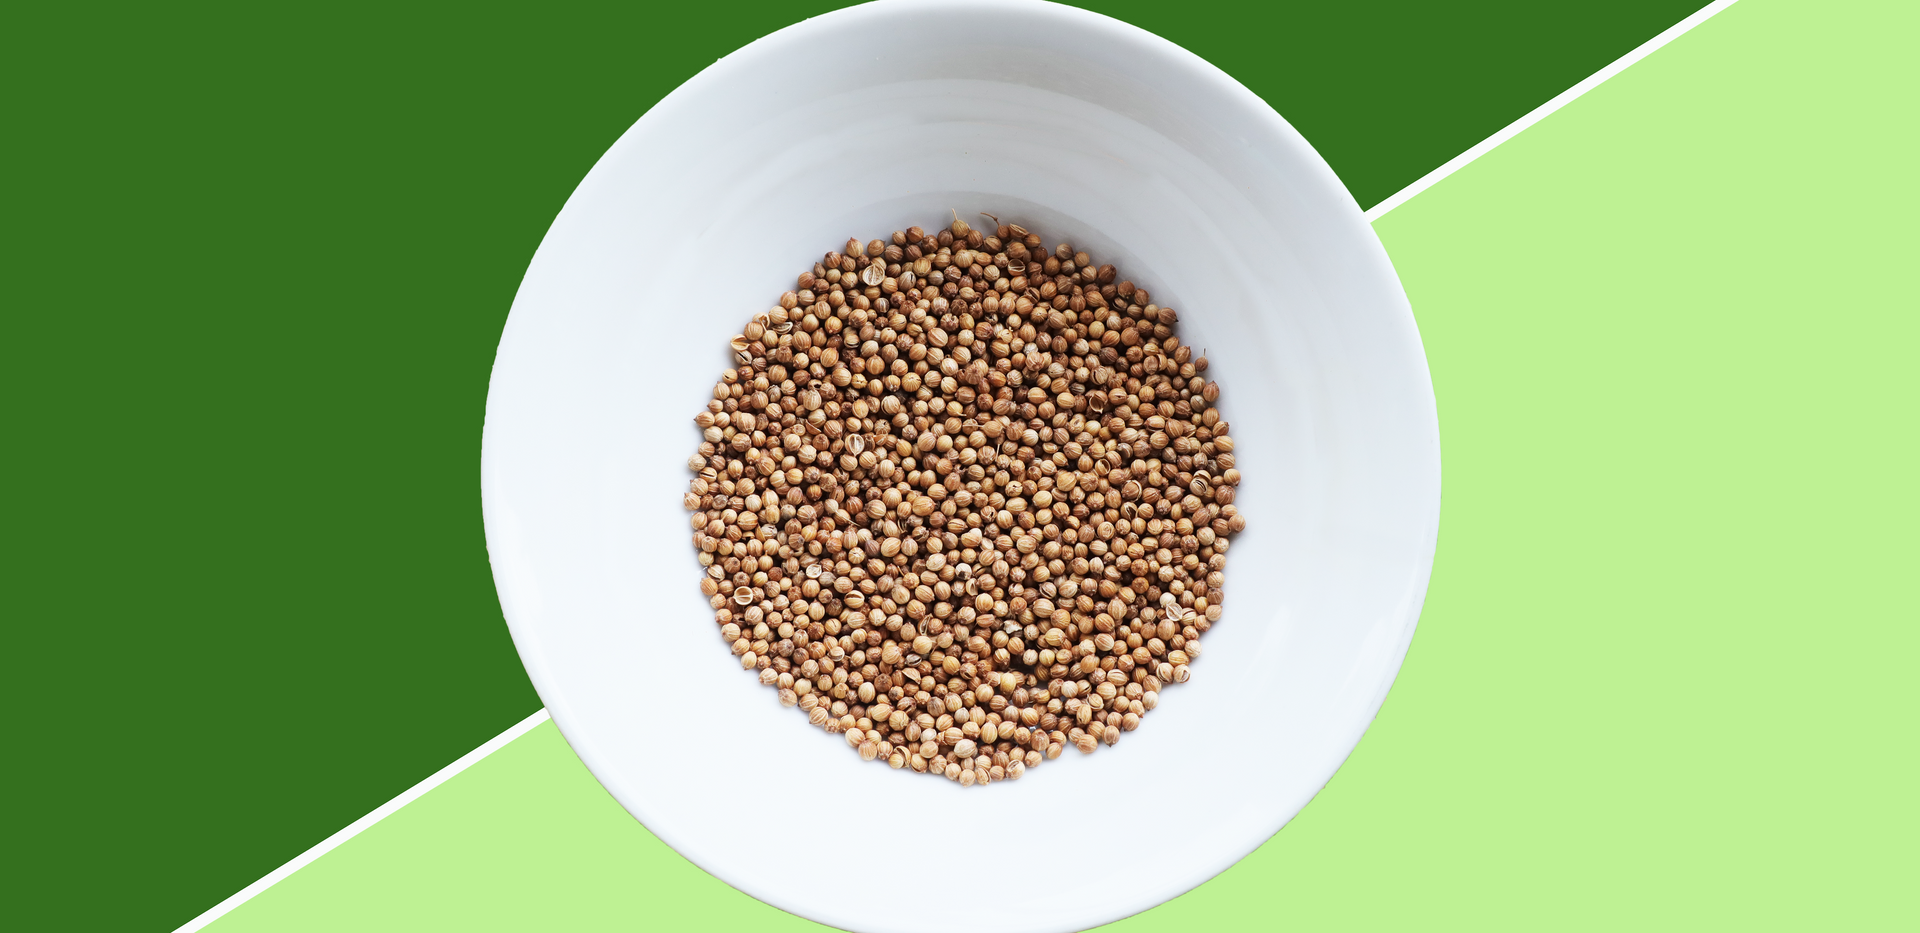 SP58 - Coriander Seed